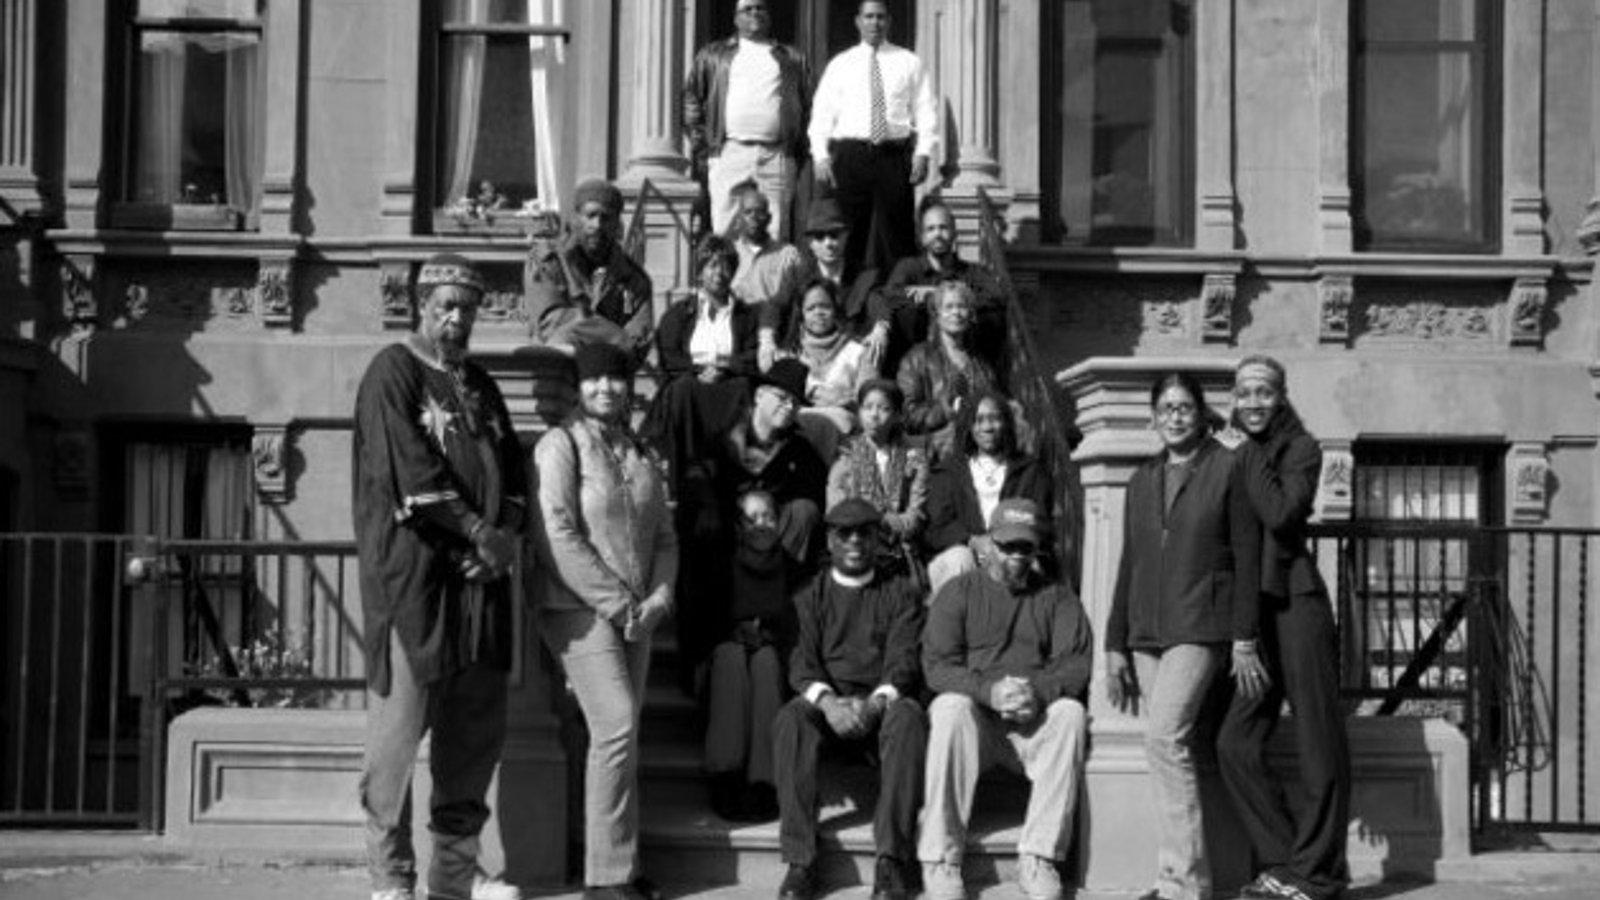 Rezoning Harlem - A Community Fights Against Gentrification